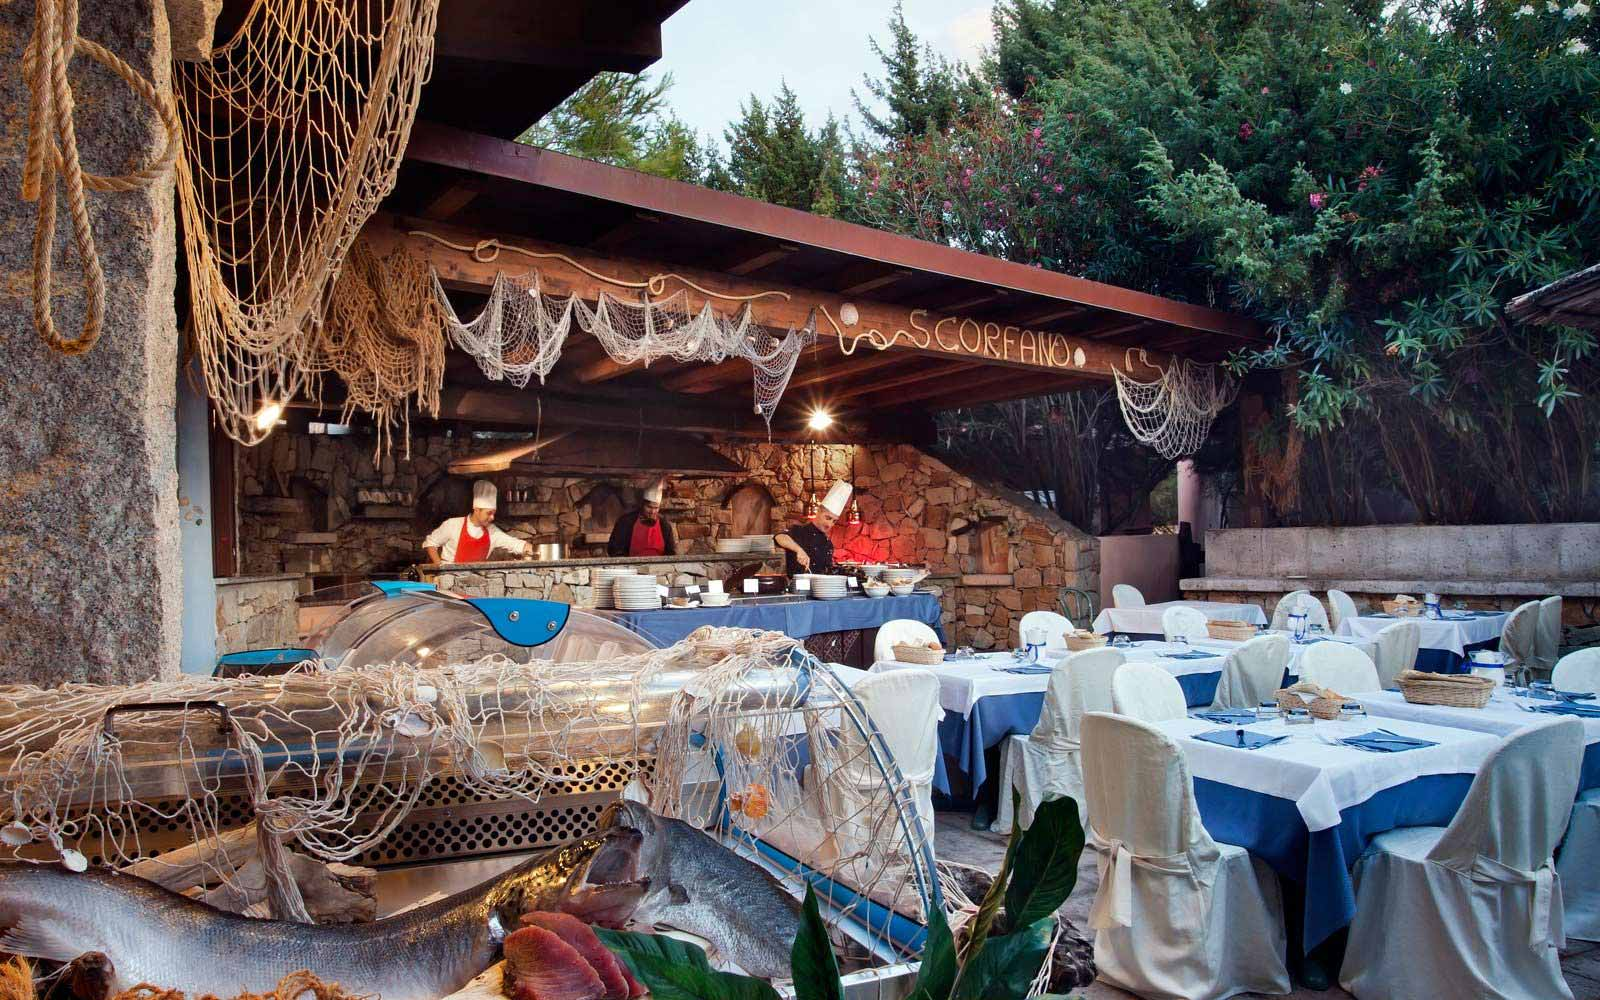 Scorfano Restaurant at Hotel Duna Bianca